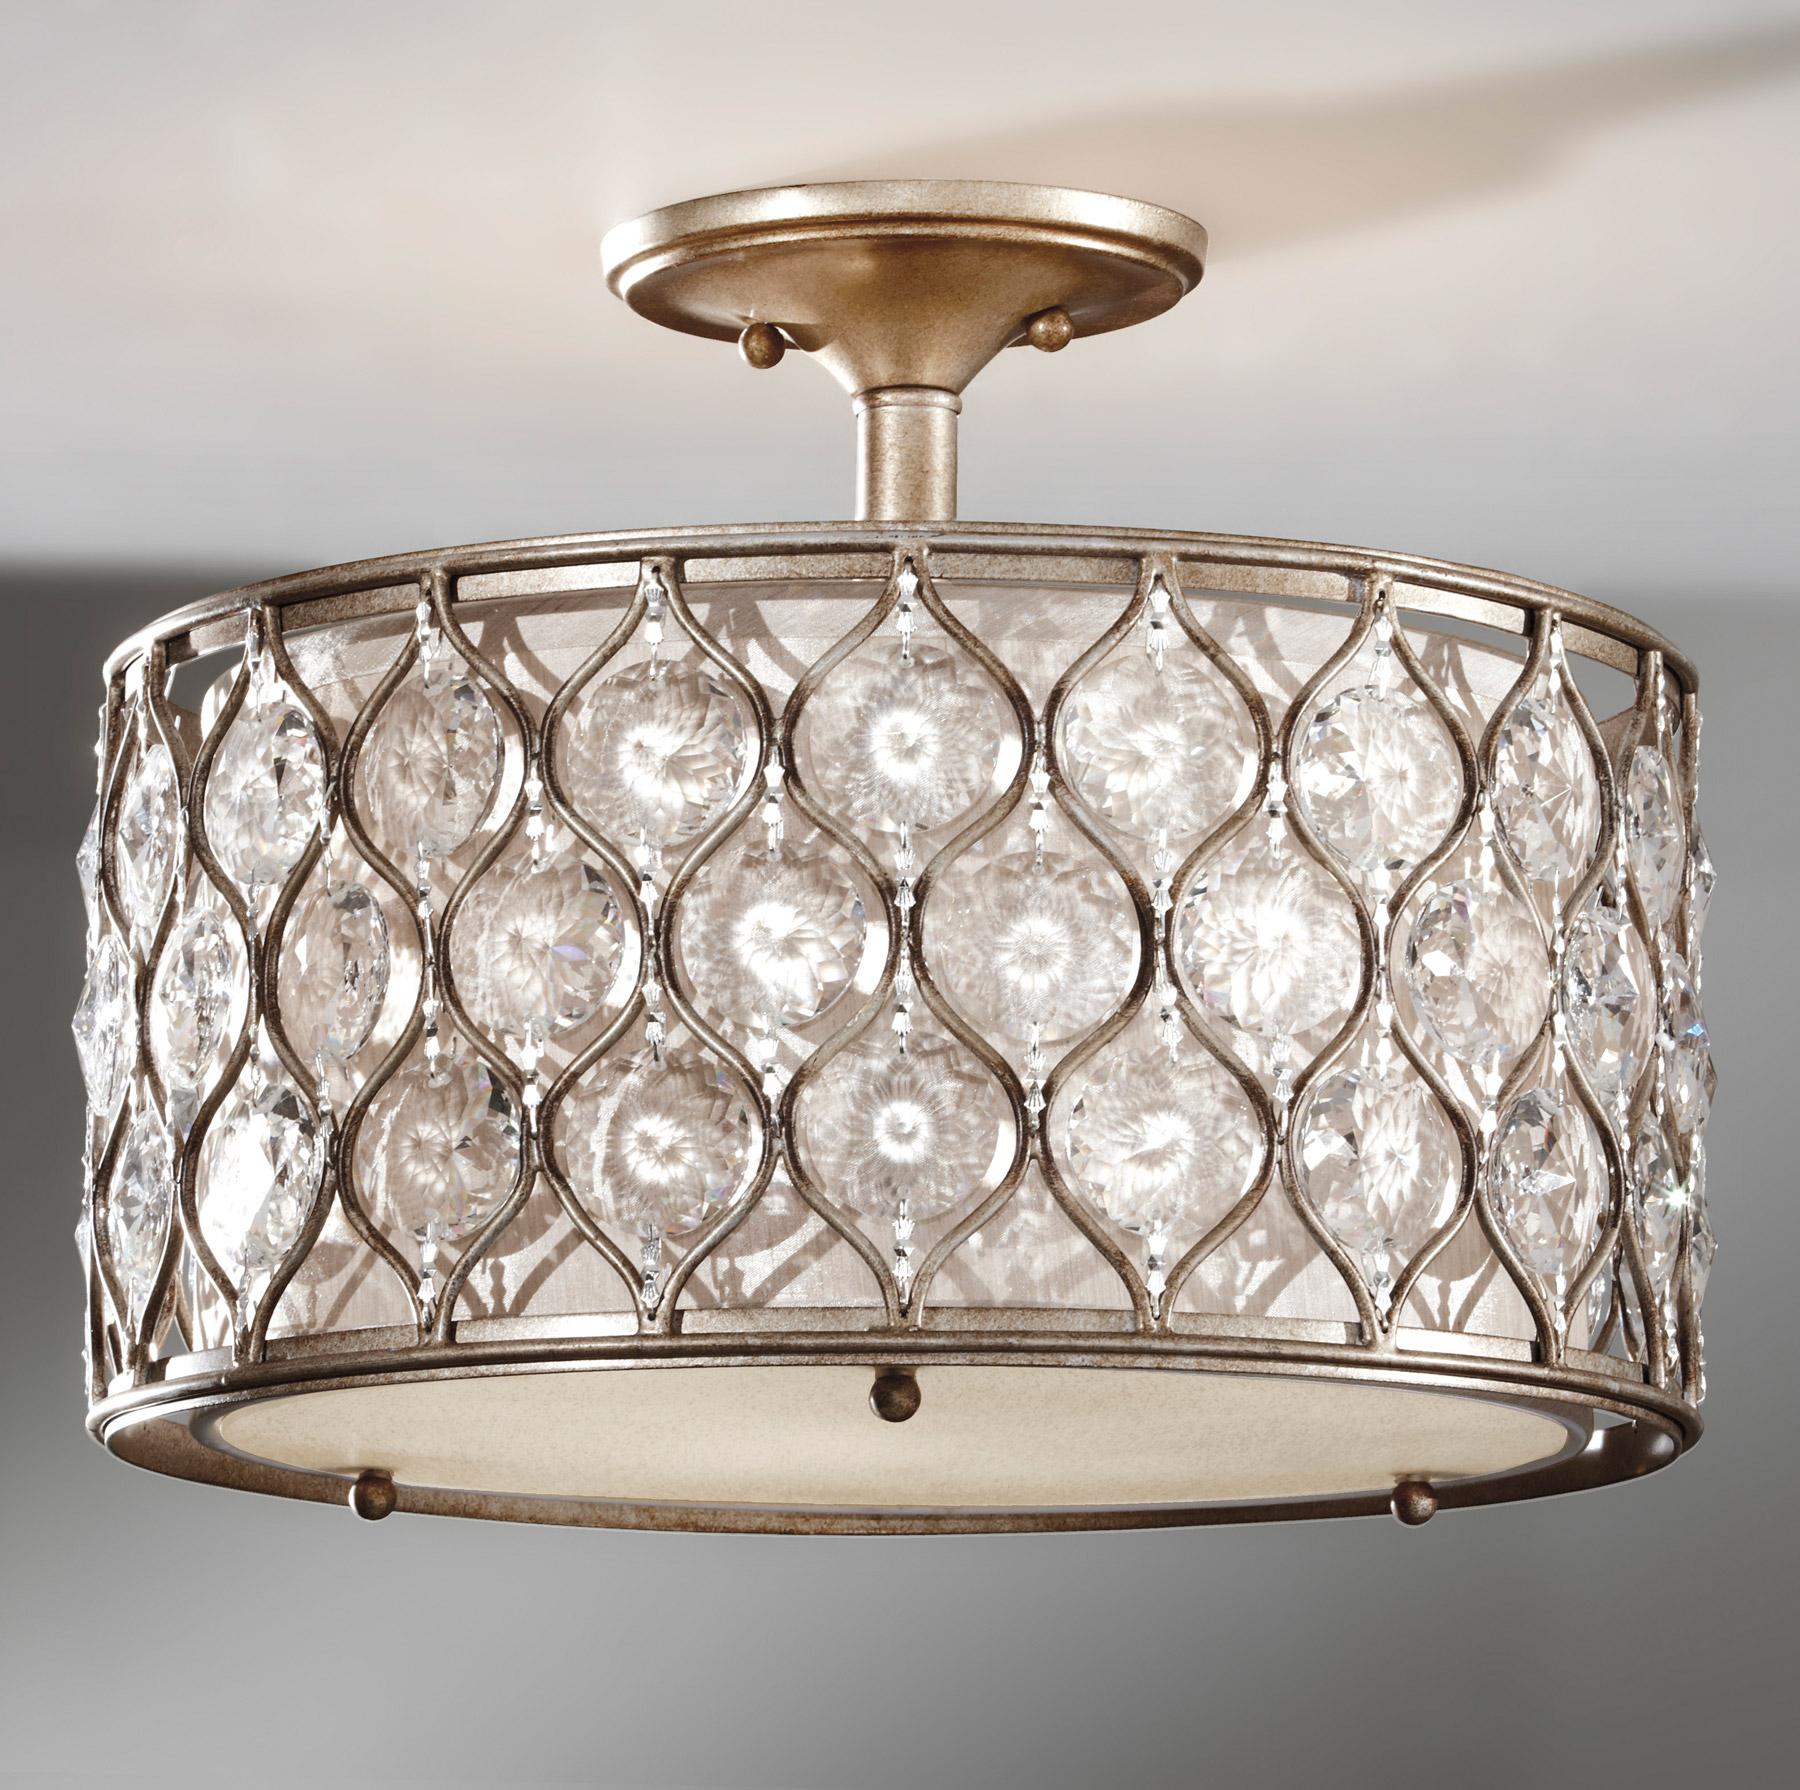 Ceiling fan crystal light fixture : Murray feiss sf bus crystal lucia semi flush ceiling fixture